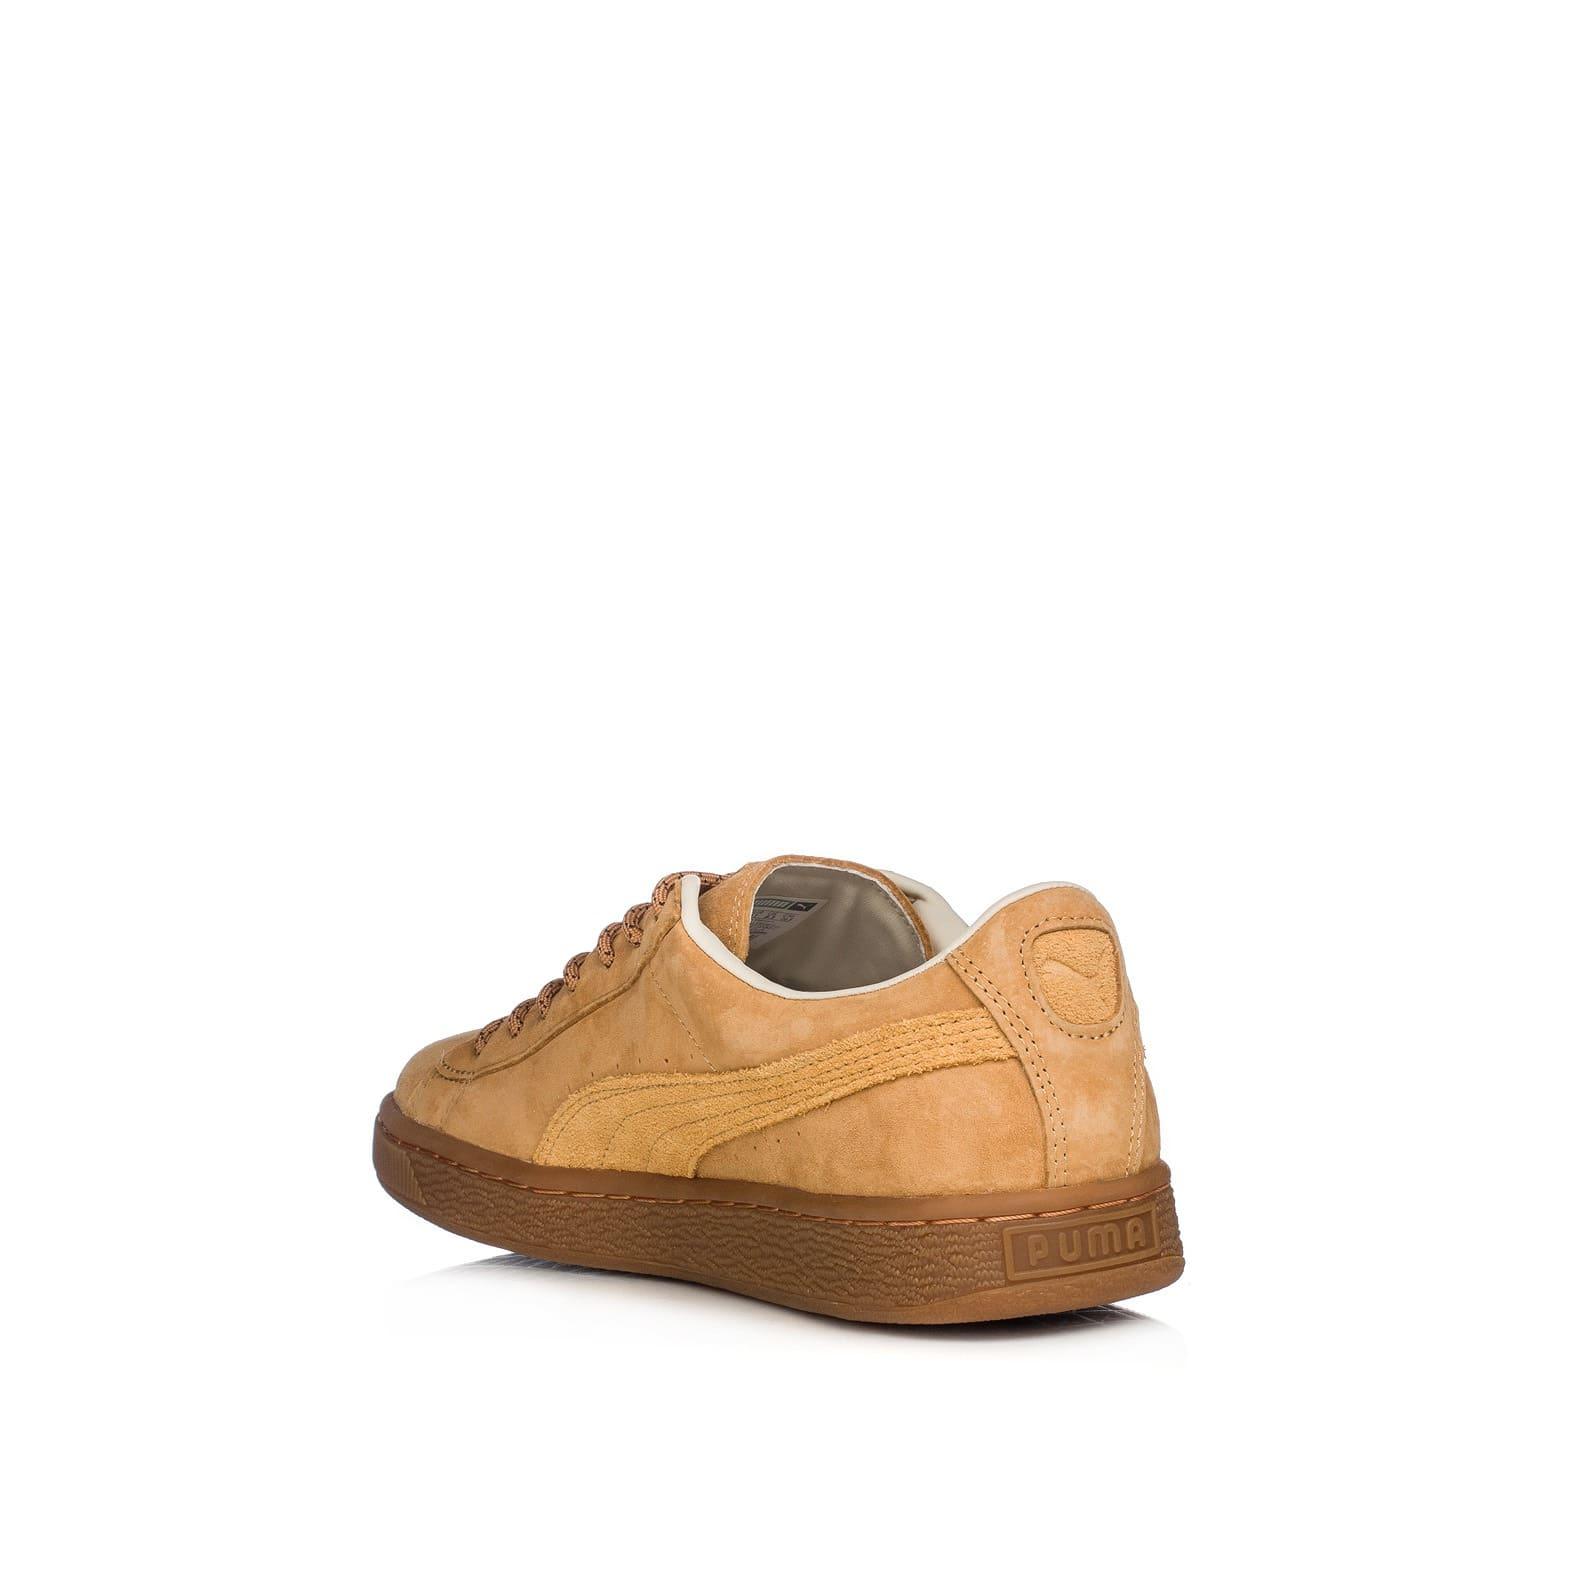 puma-basket-classic-winterized-361324-01